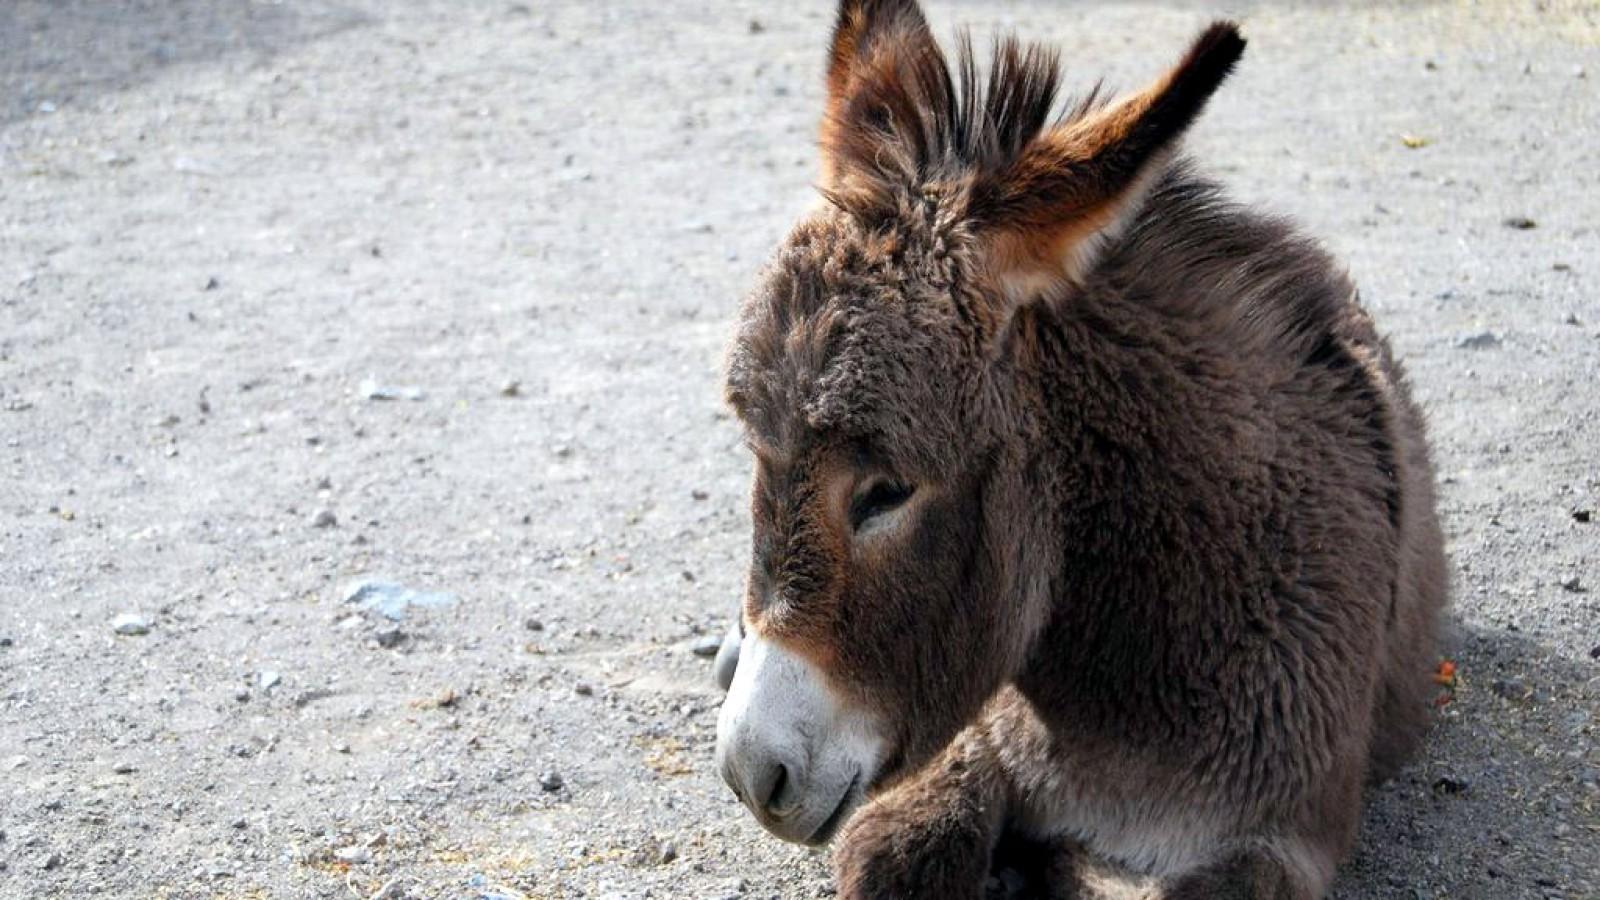 cute donkey    Animal HD Wallpaper